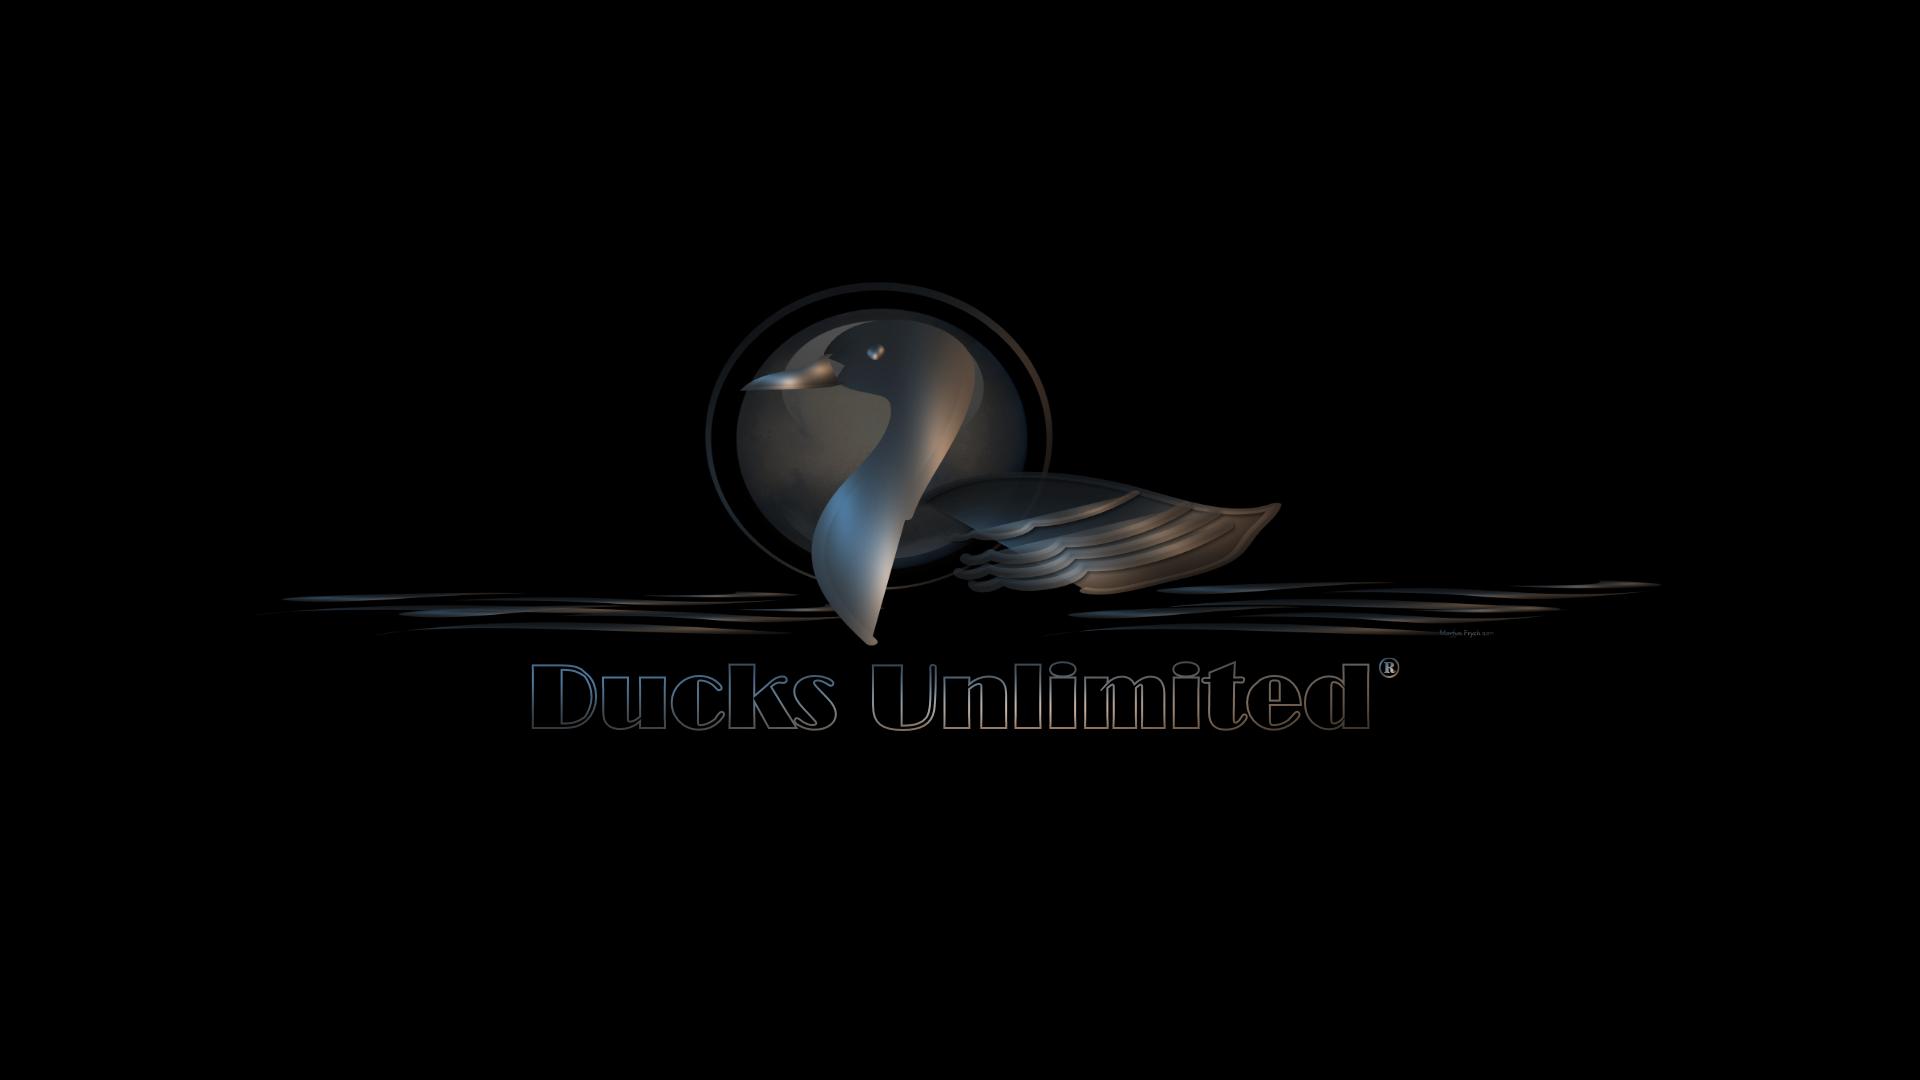 Ducks Unlimited Wallpaper   FREE DOWNLOAD HD WALLPAPERS 1920x1080